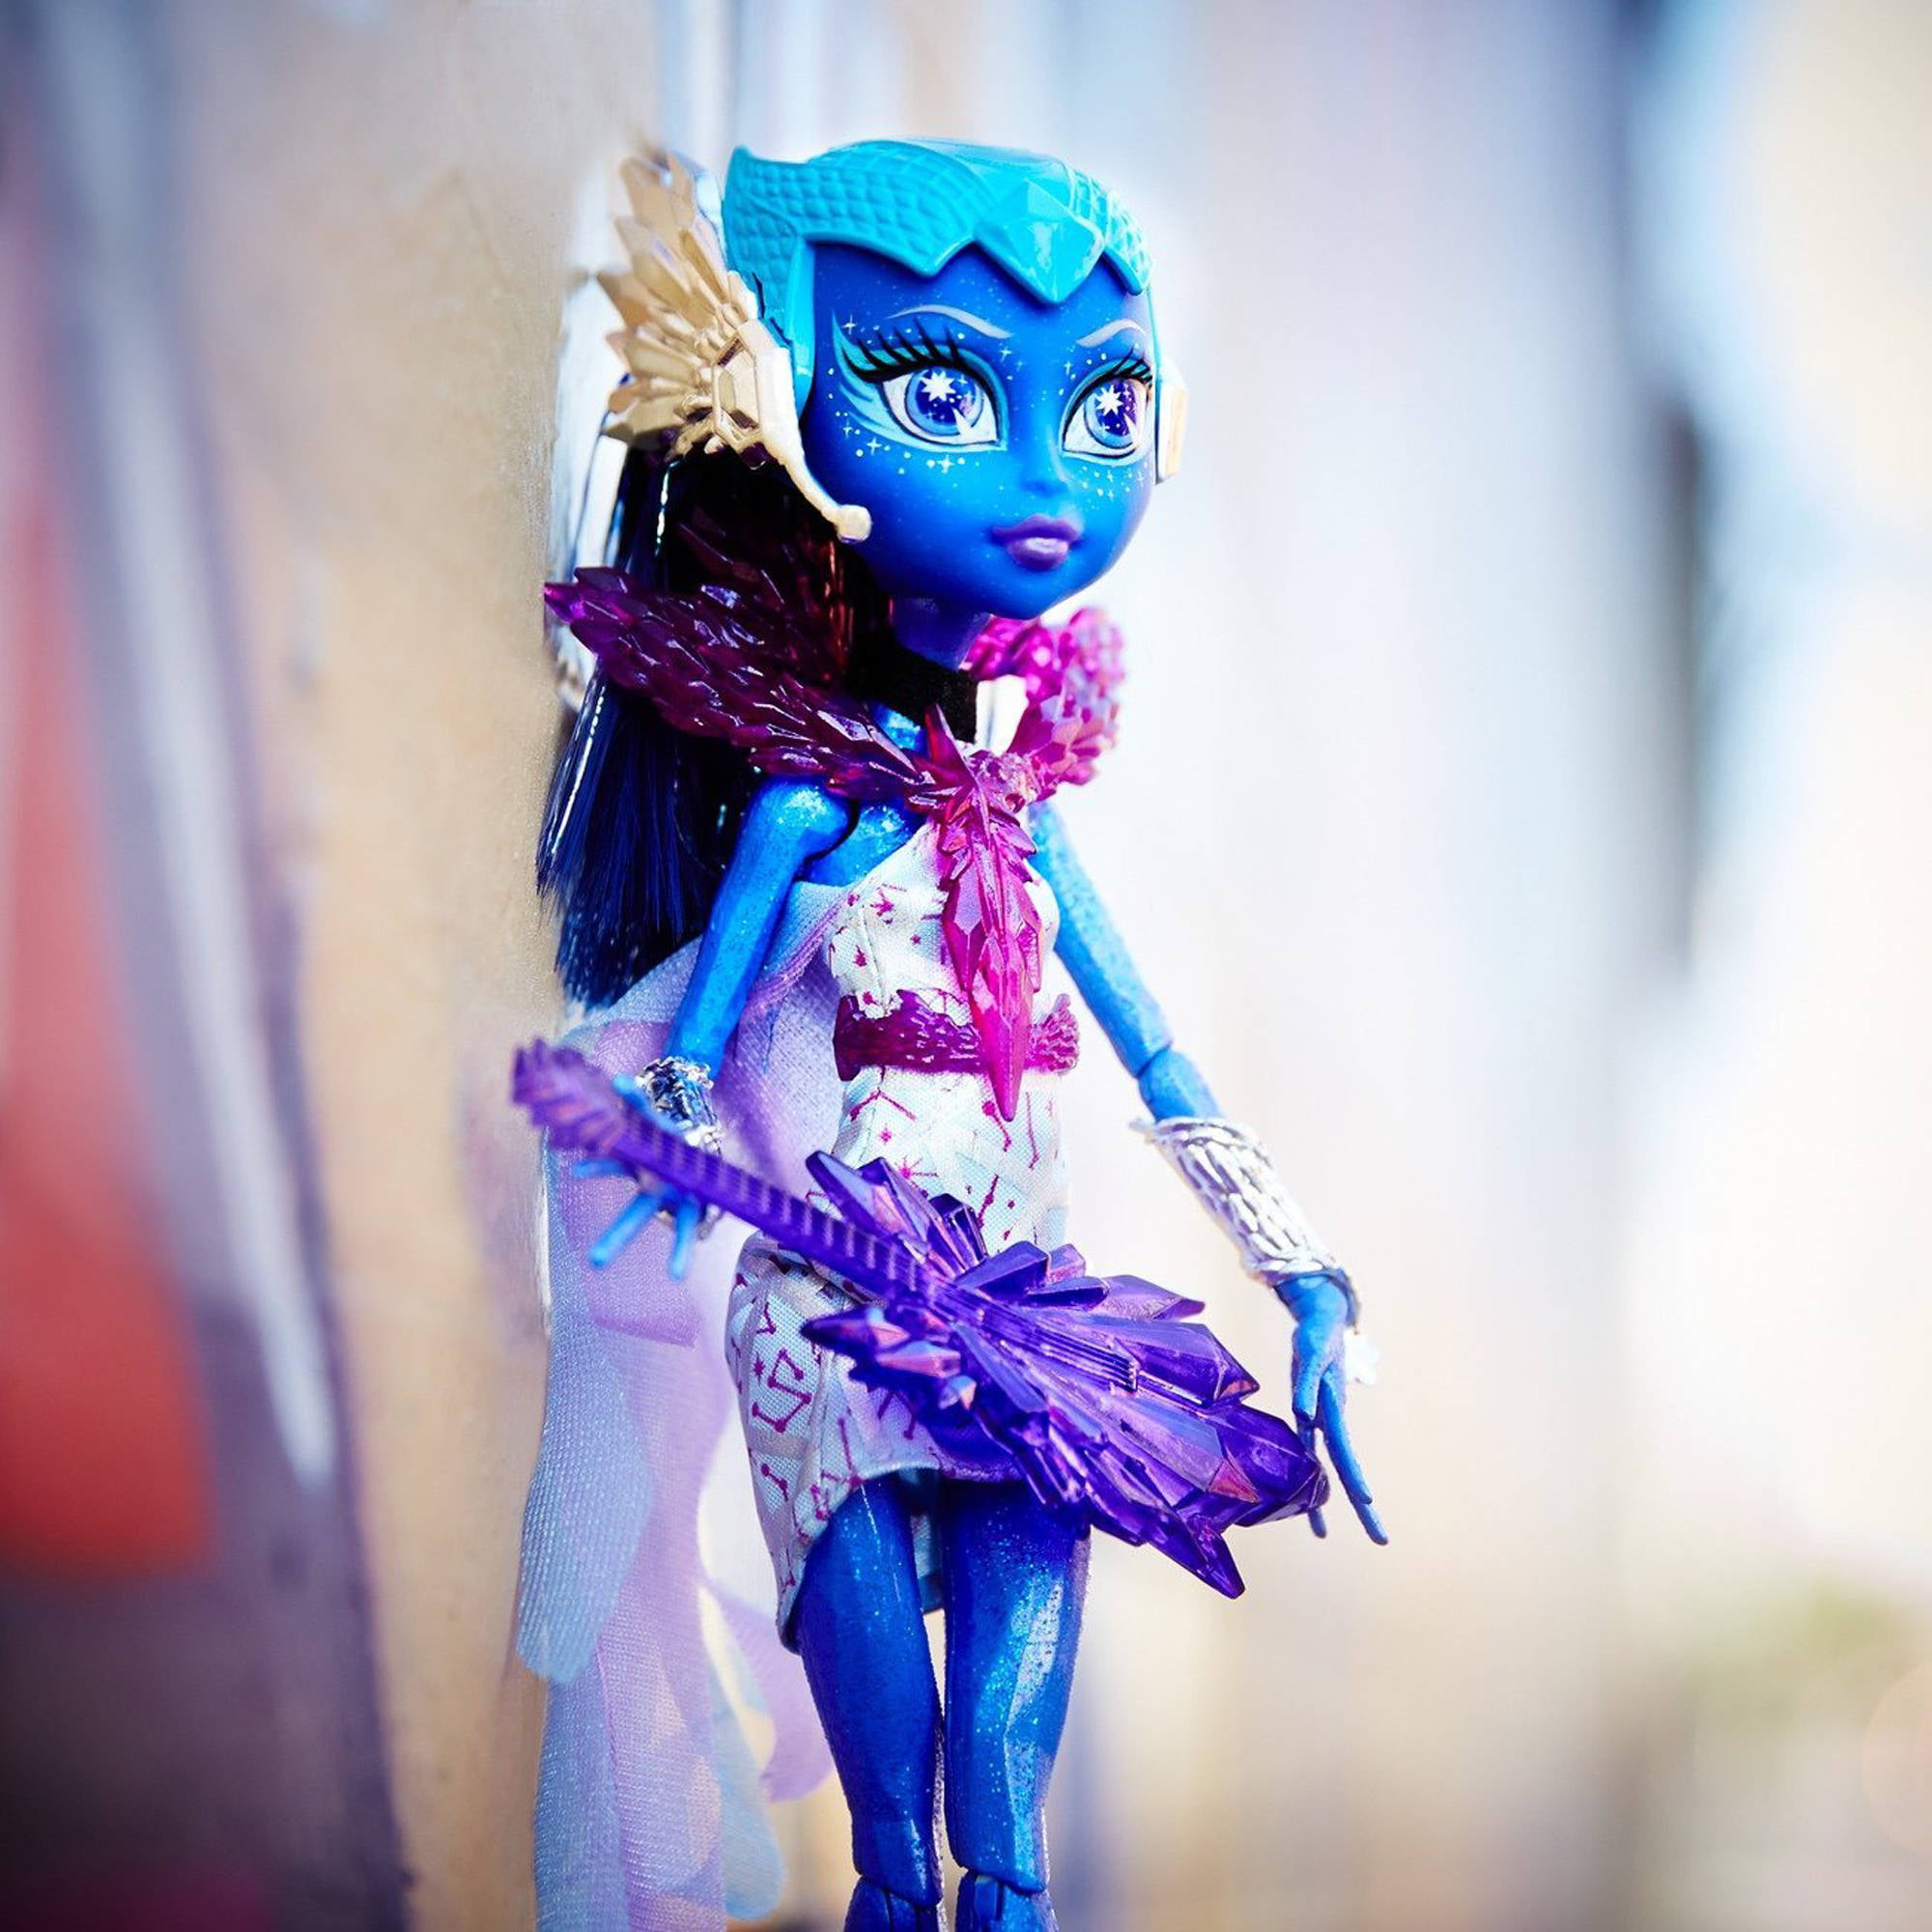 Monster High Bedroom Decorations Monster High Boo York Flotation Station And Astranova Doll